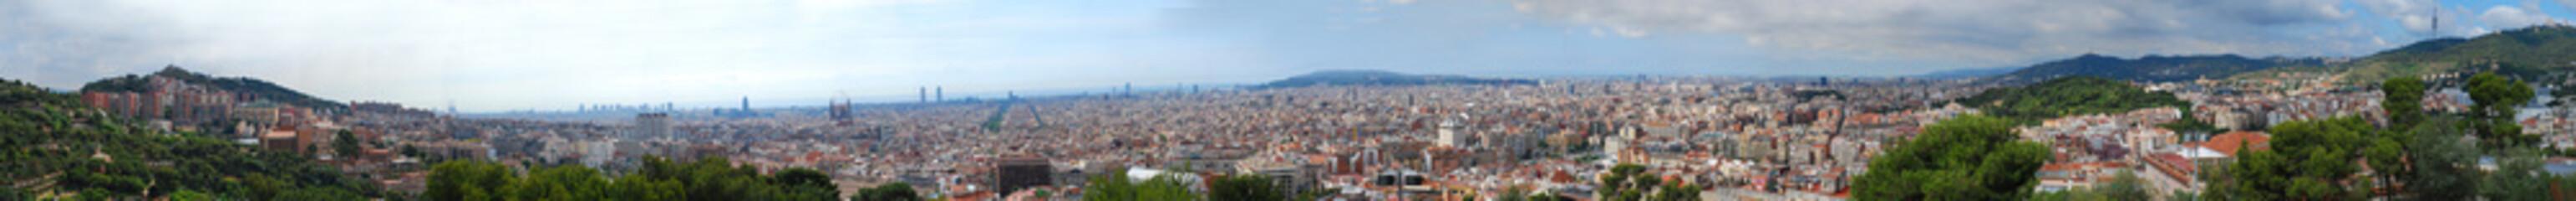 Panorama Barcelona 2